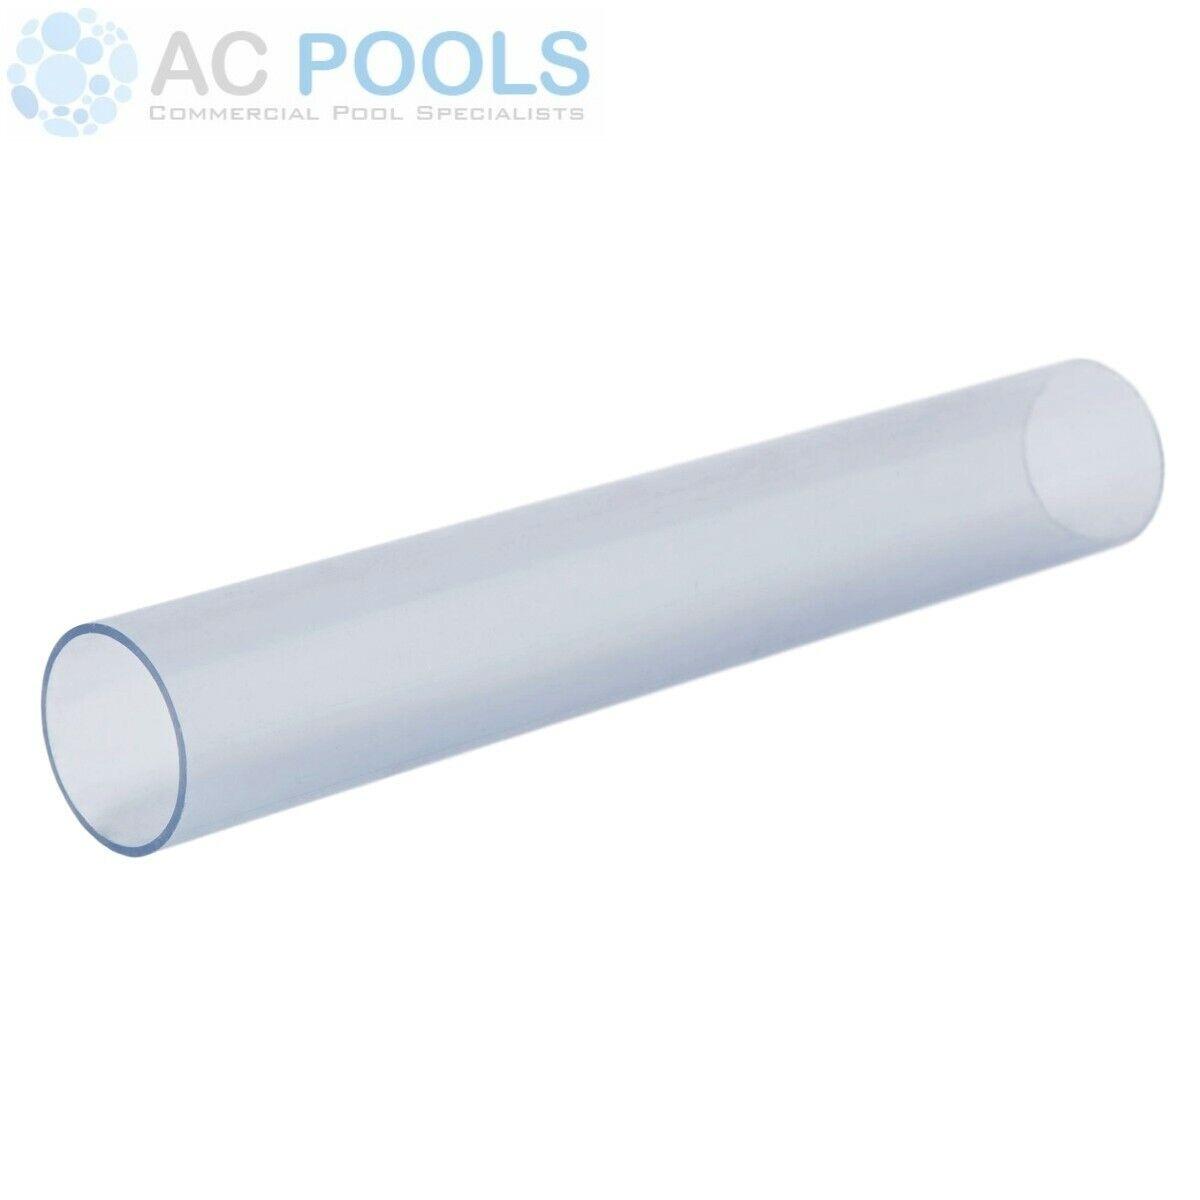 Clear PVC Pressure Pipe 150mm (500mm Length) Rigid